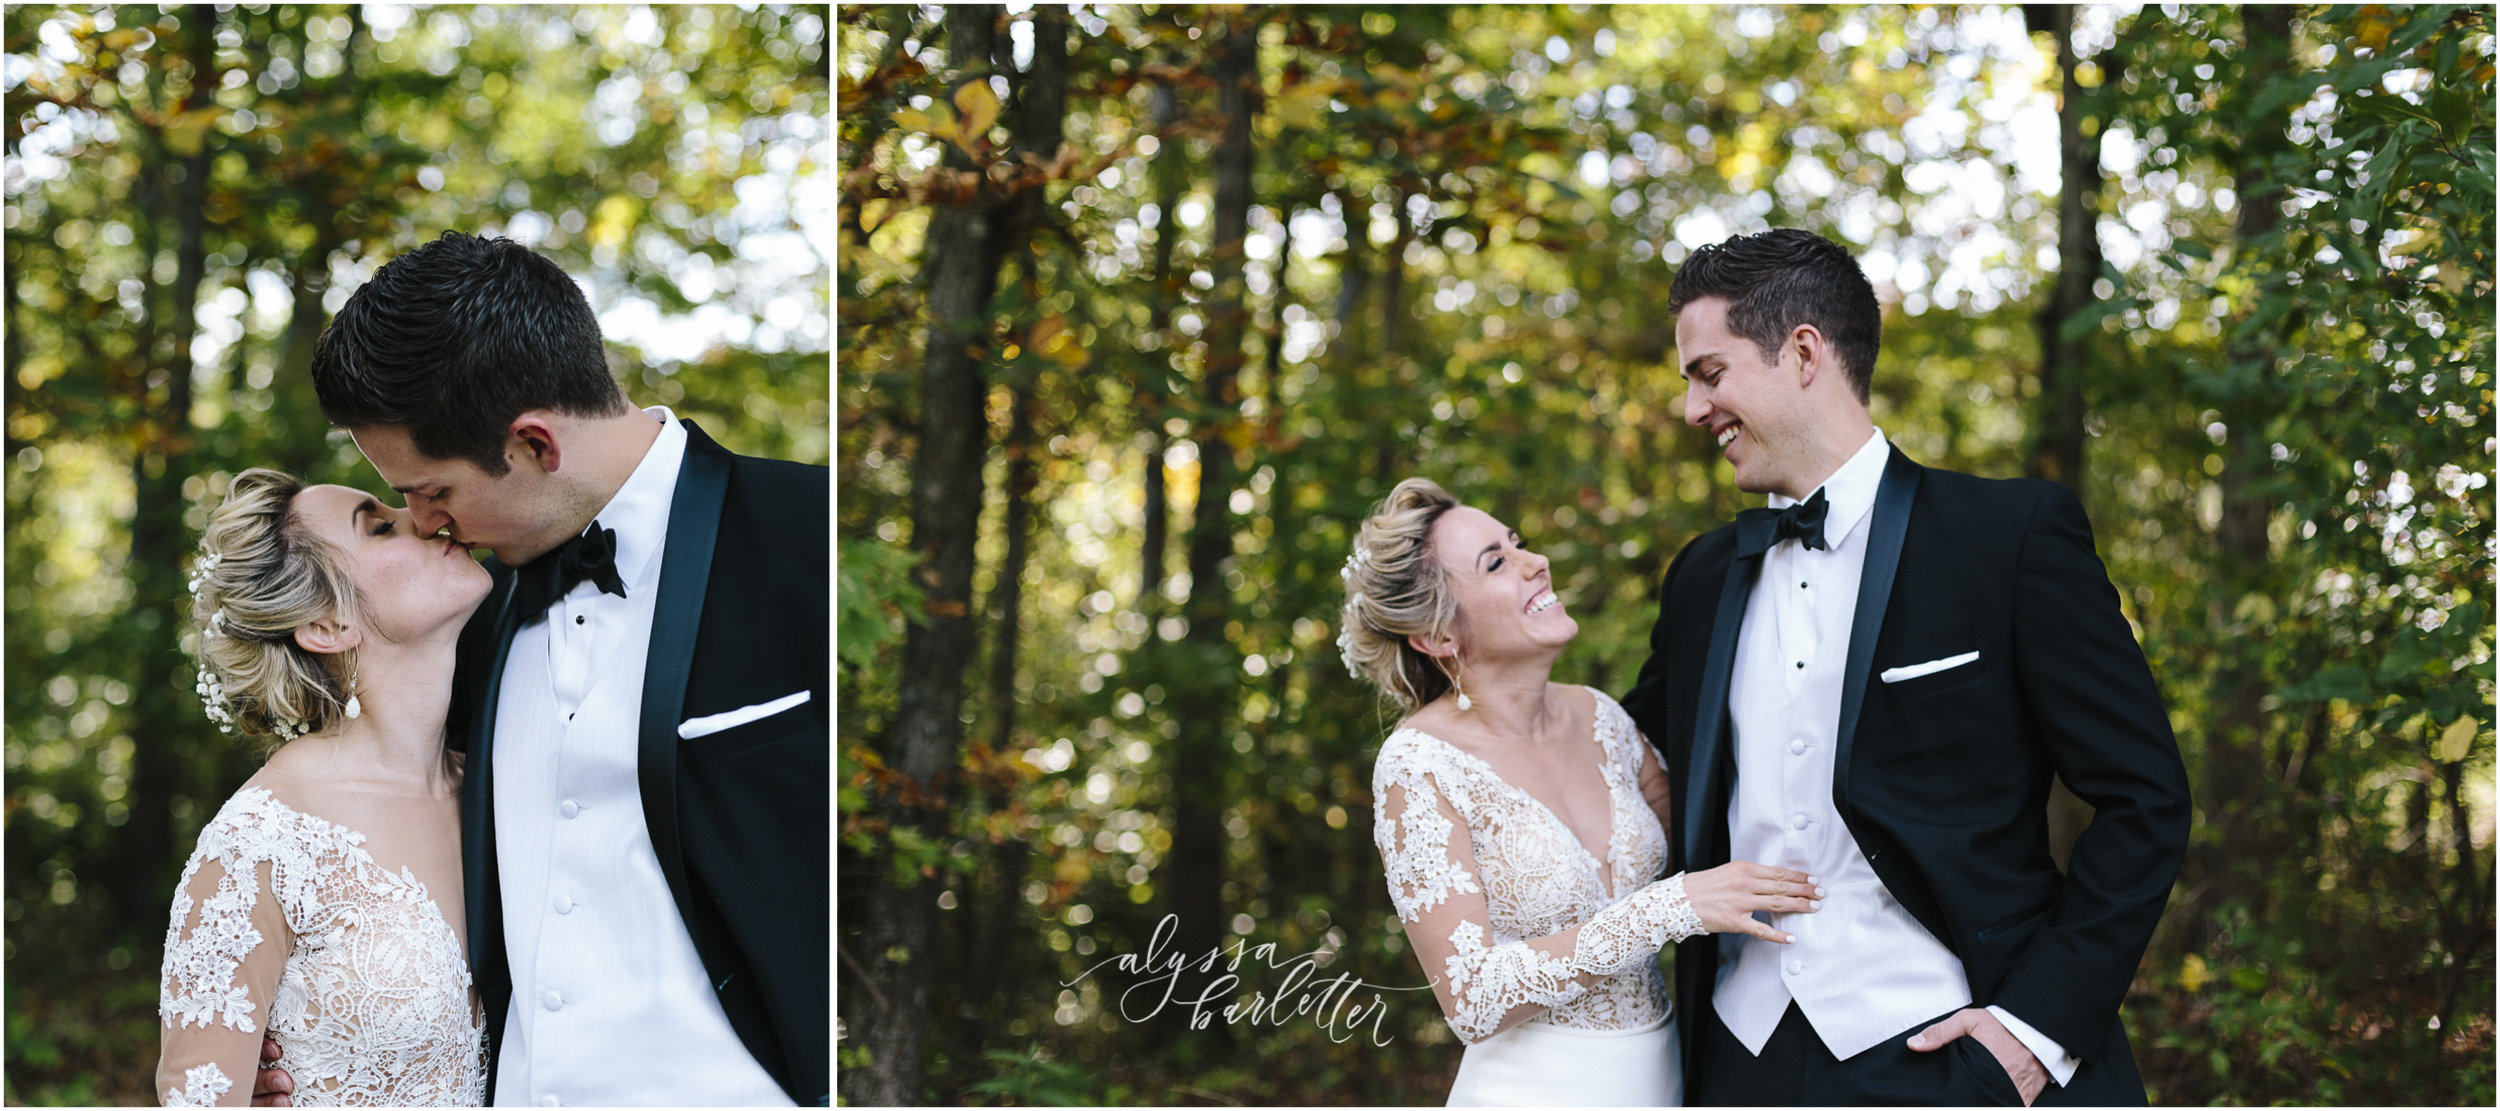 alyssa barletter photography fayetteville arkansas wedding photos micah and colin-1-27.jpg